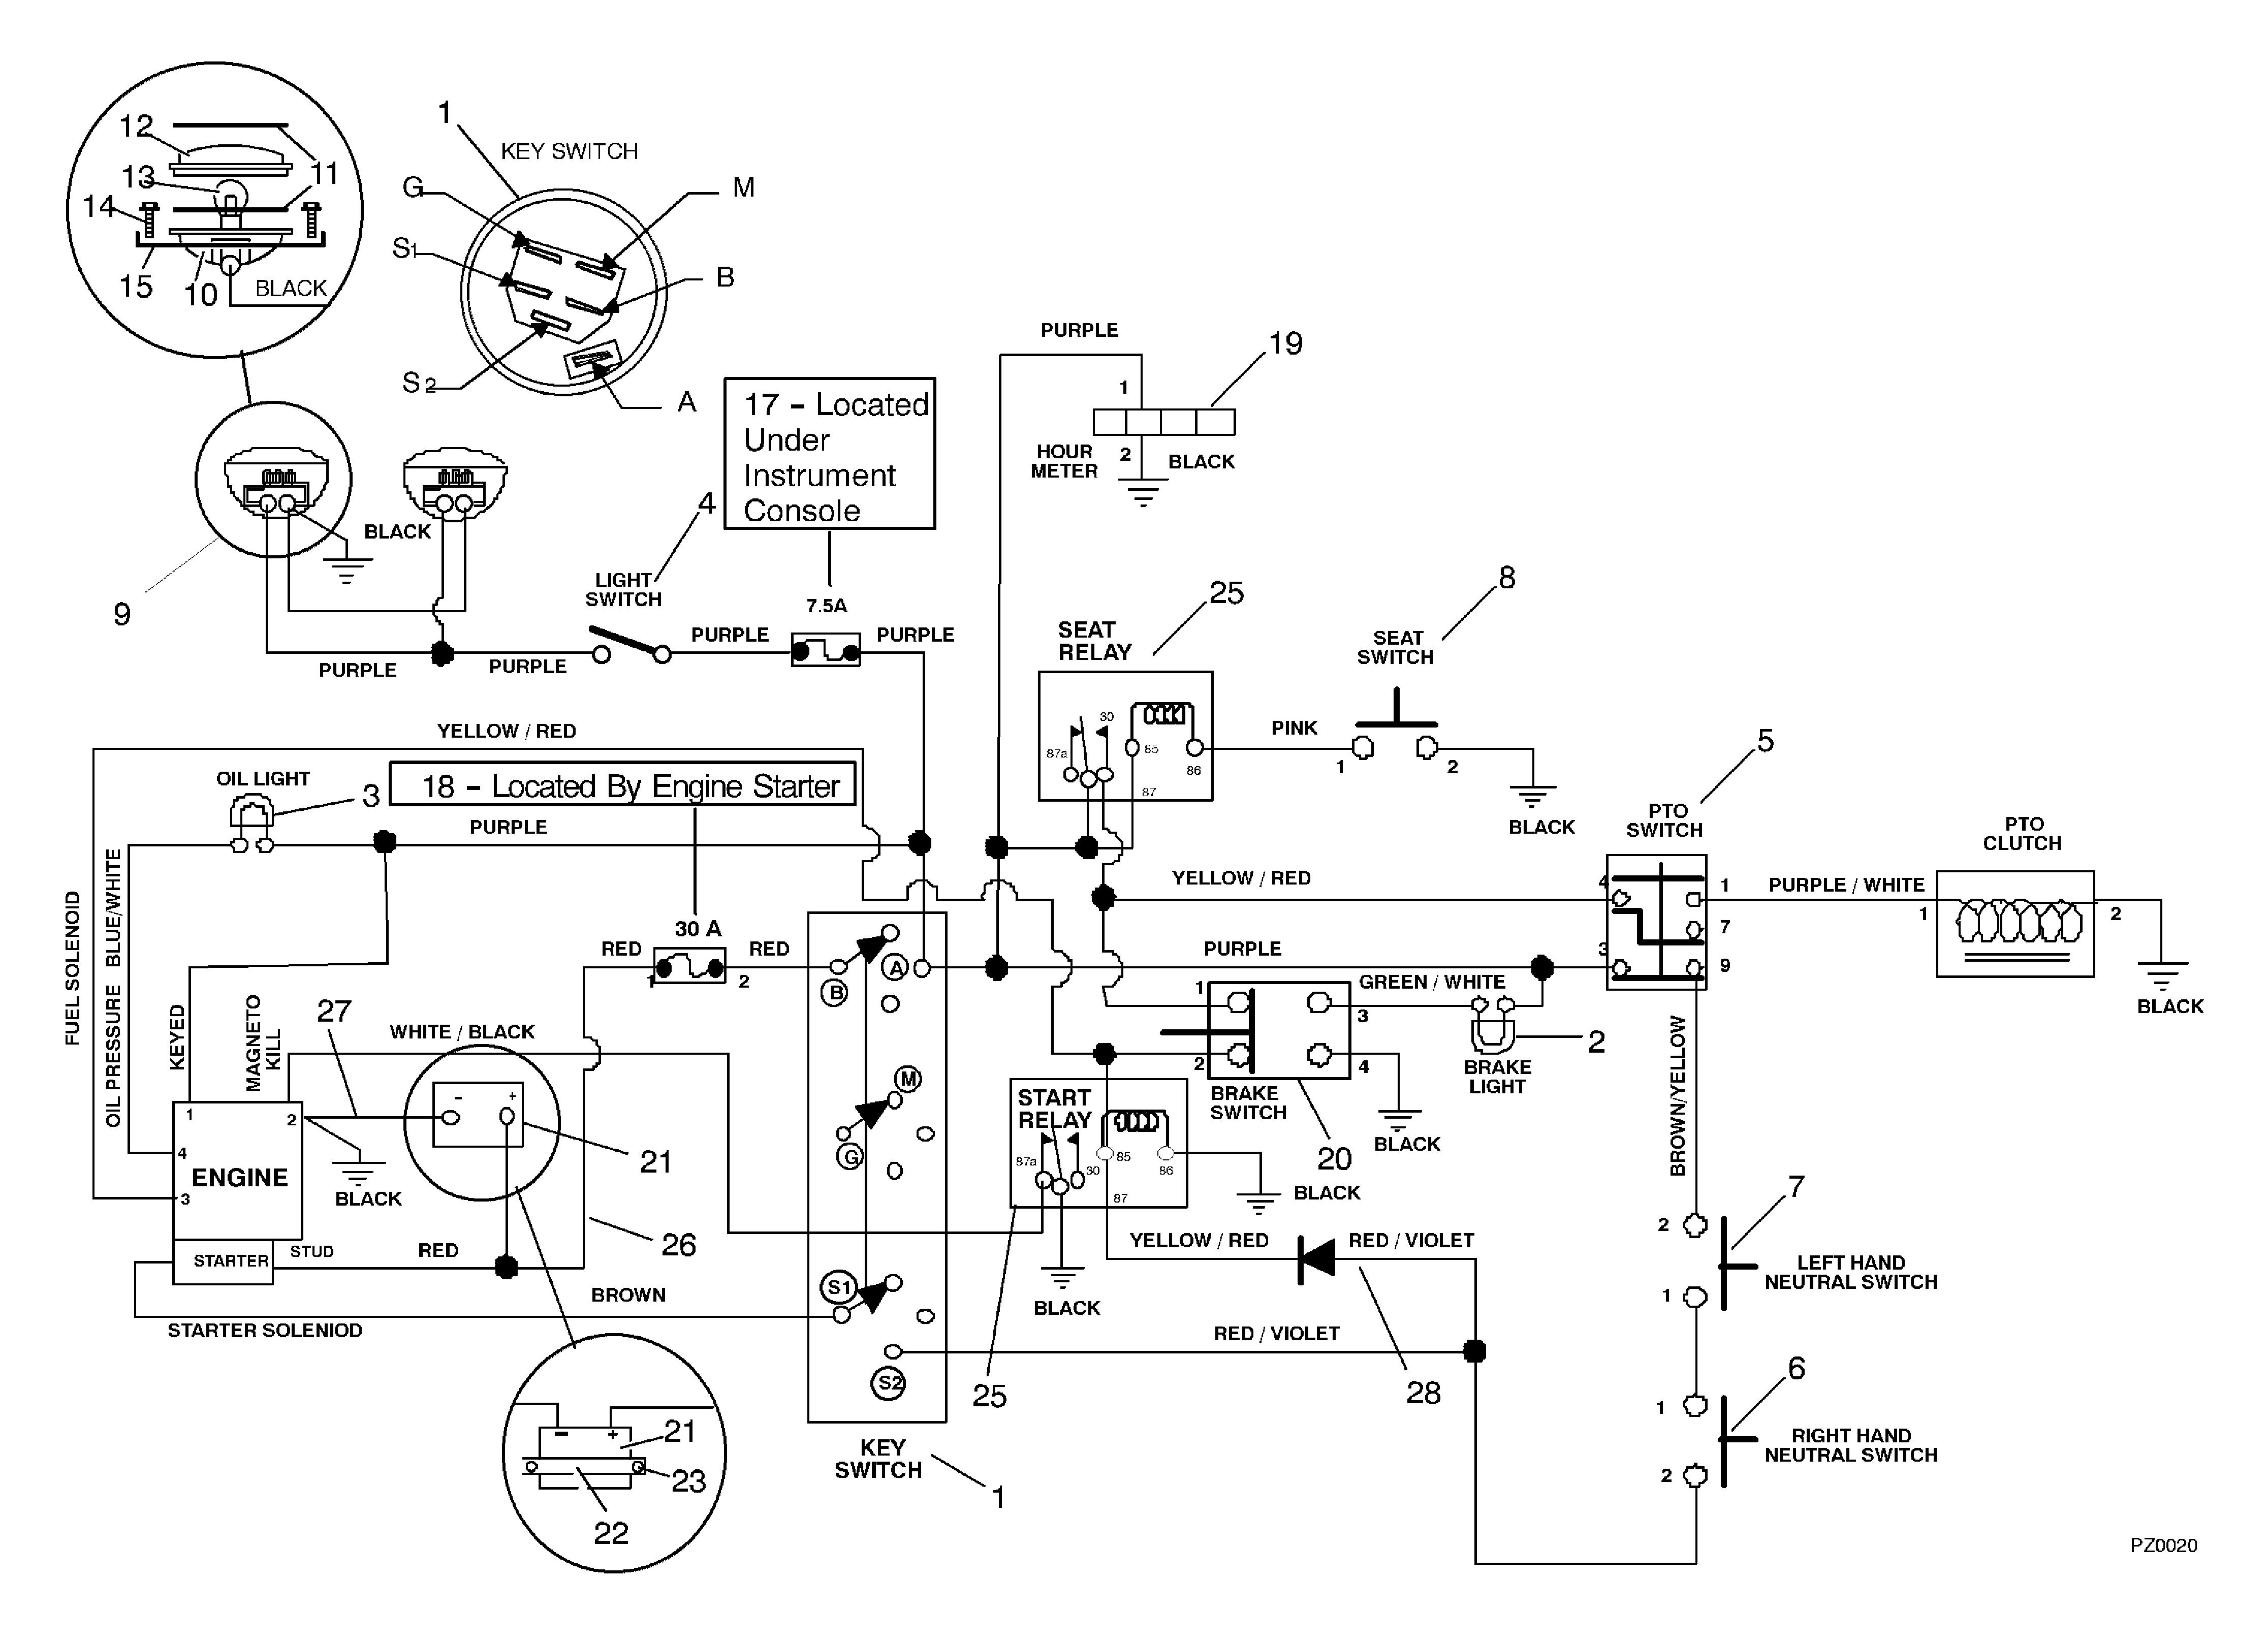 Kohler Command 12 5 Wiring Diagram | Wiring Diagram - Kohler Engine Wiring Diagram